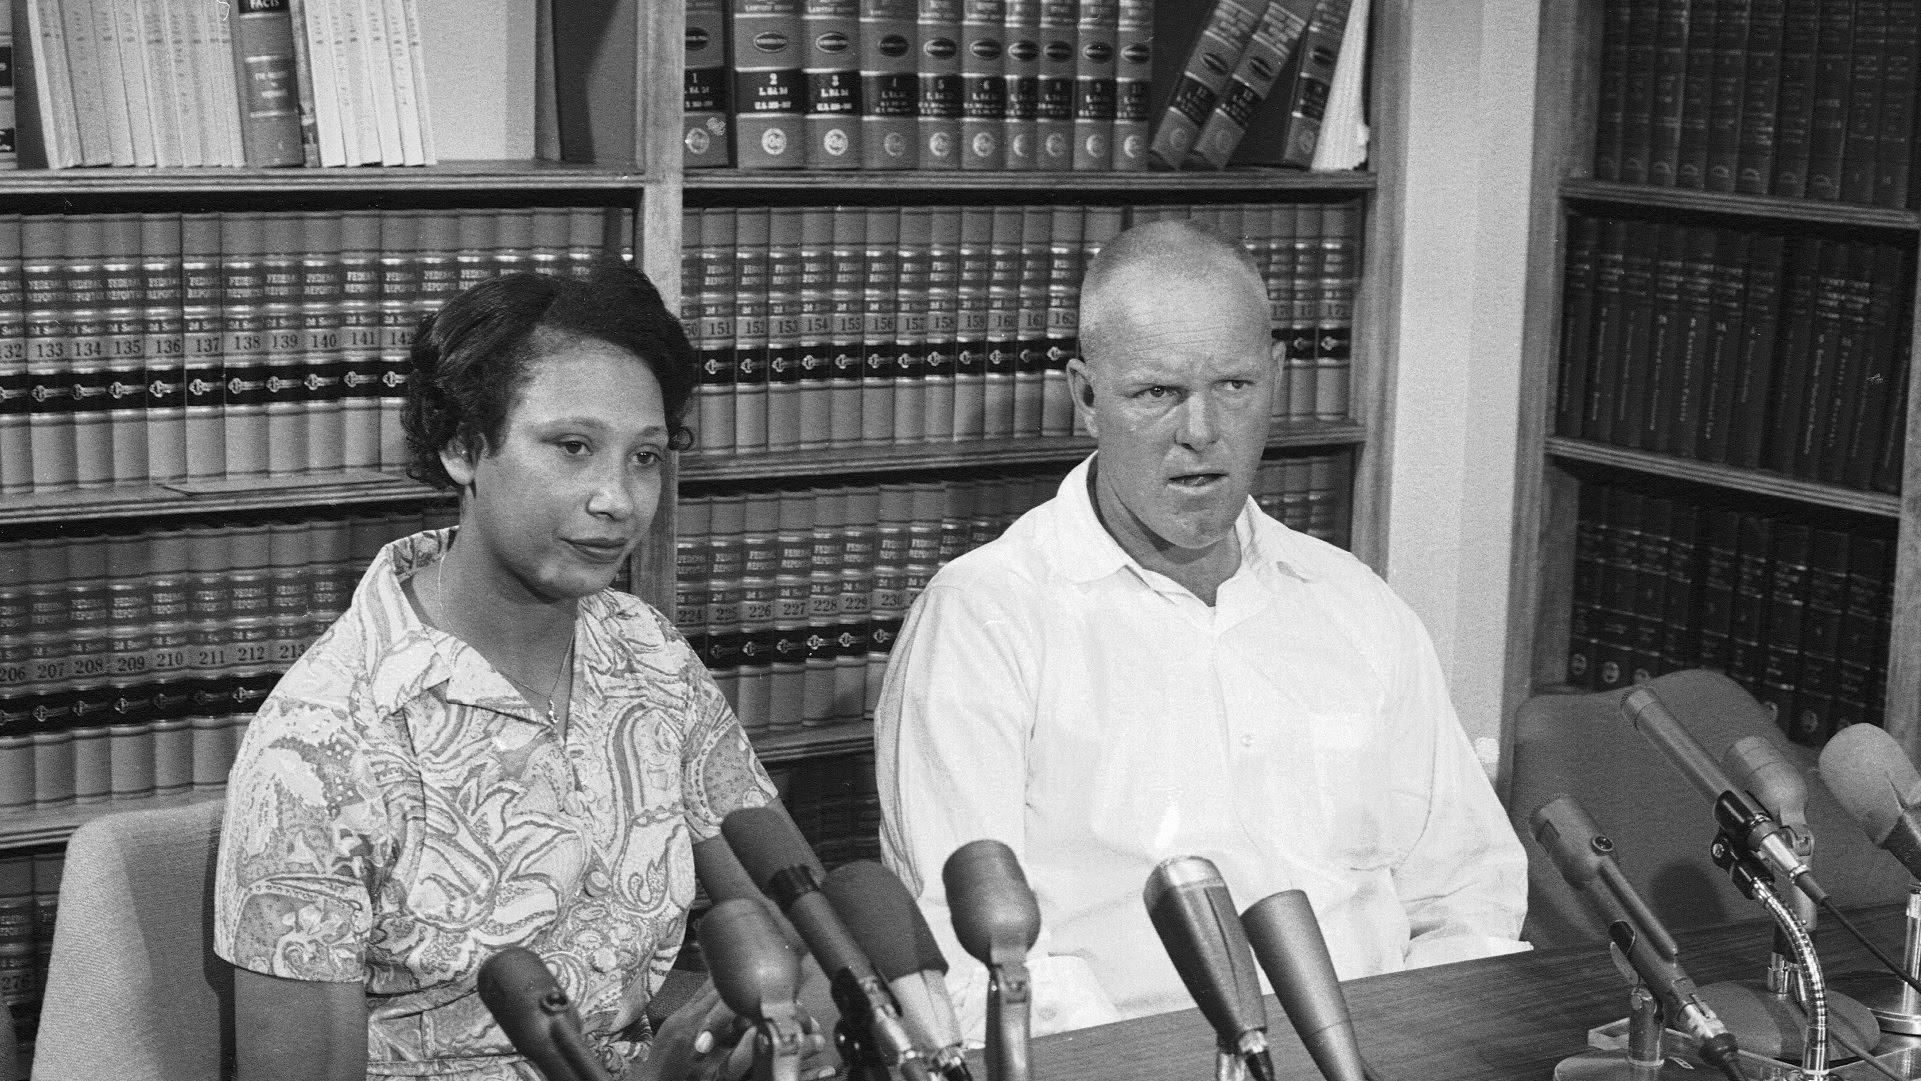 Ban on interracial marriage alabama